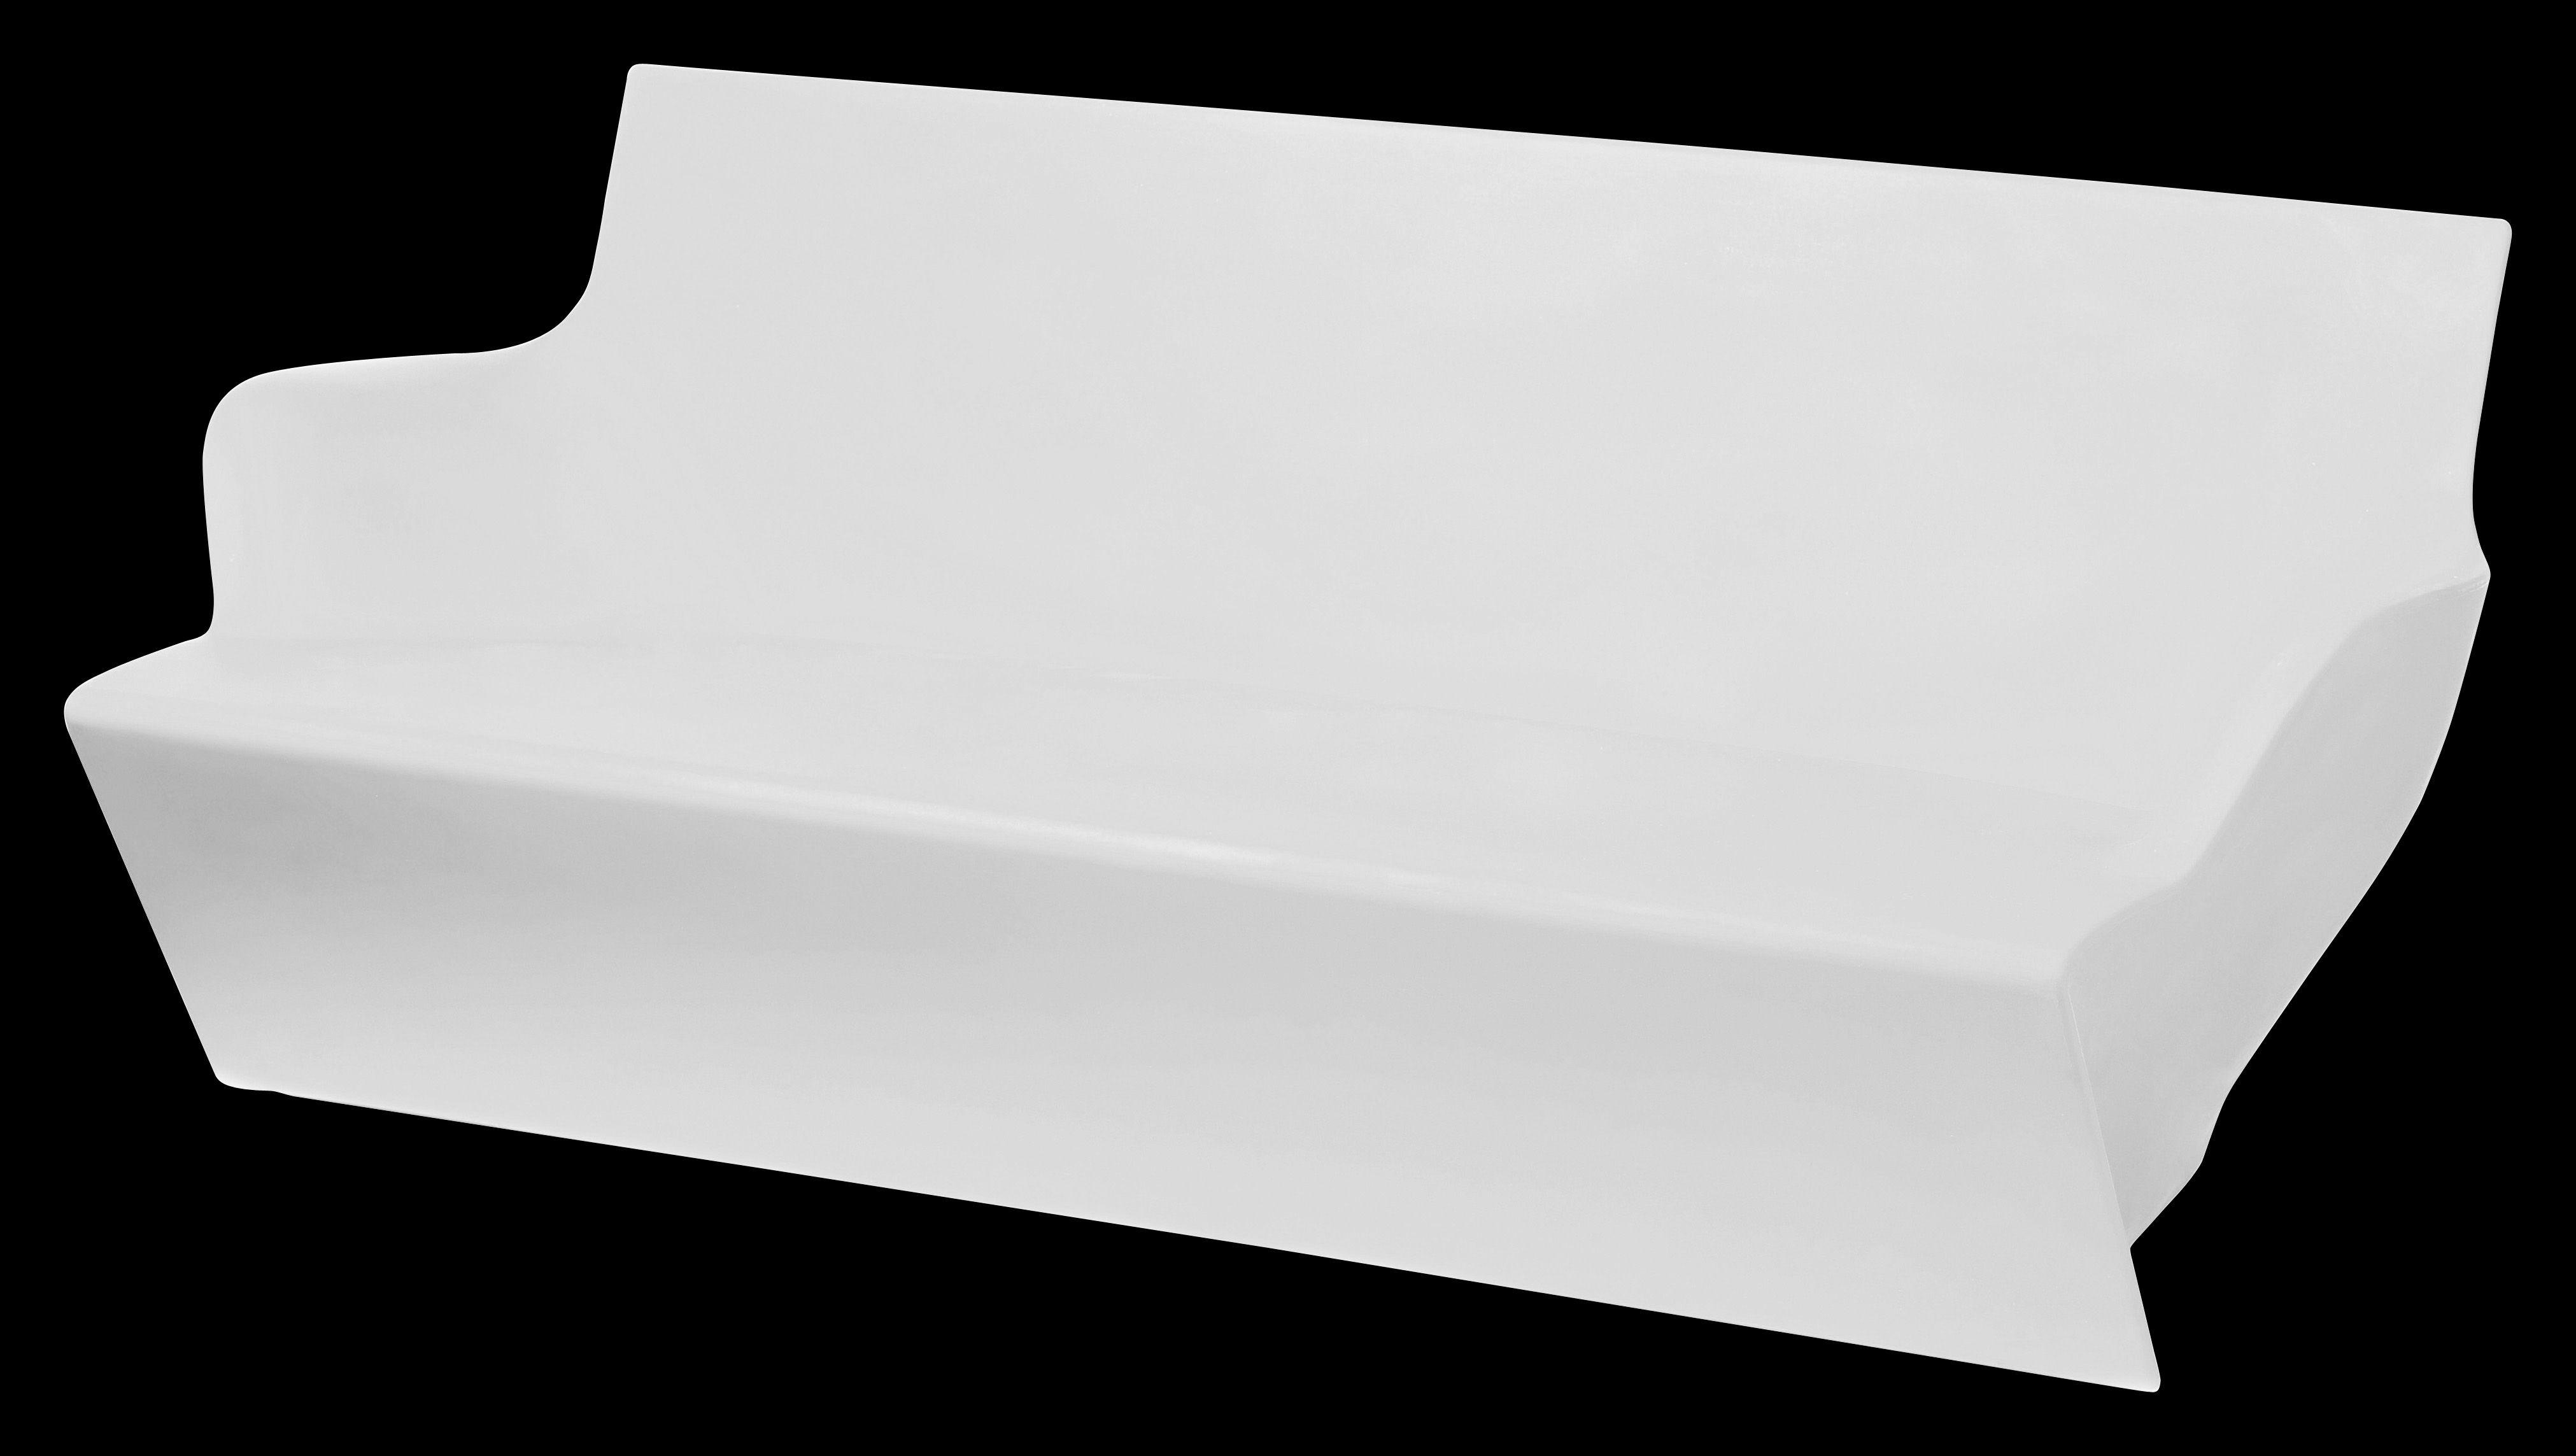 Mobilier - Mobilier lumineux - Canapé lumineux Kami Yon - Slide - Lumineux blanc - polyéthène recyclable